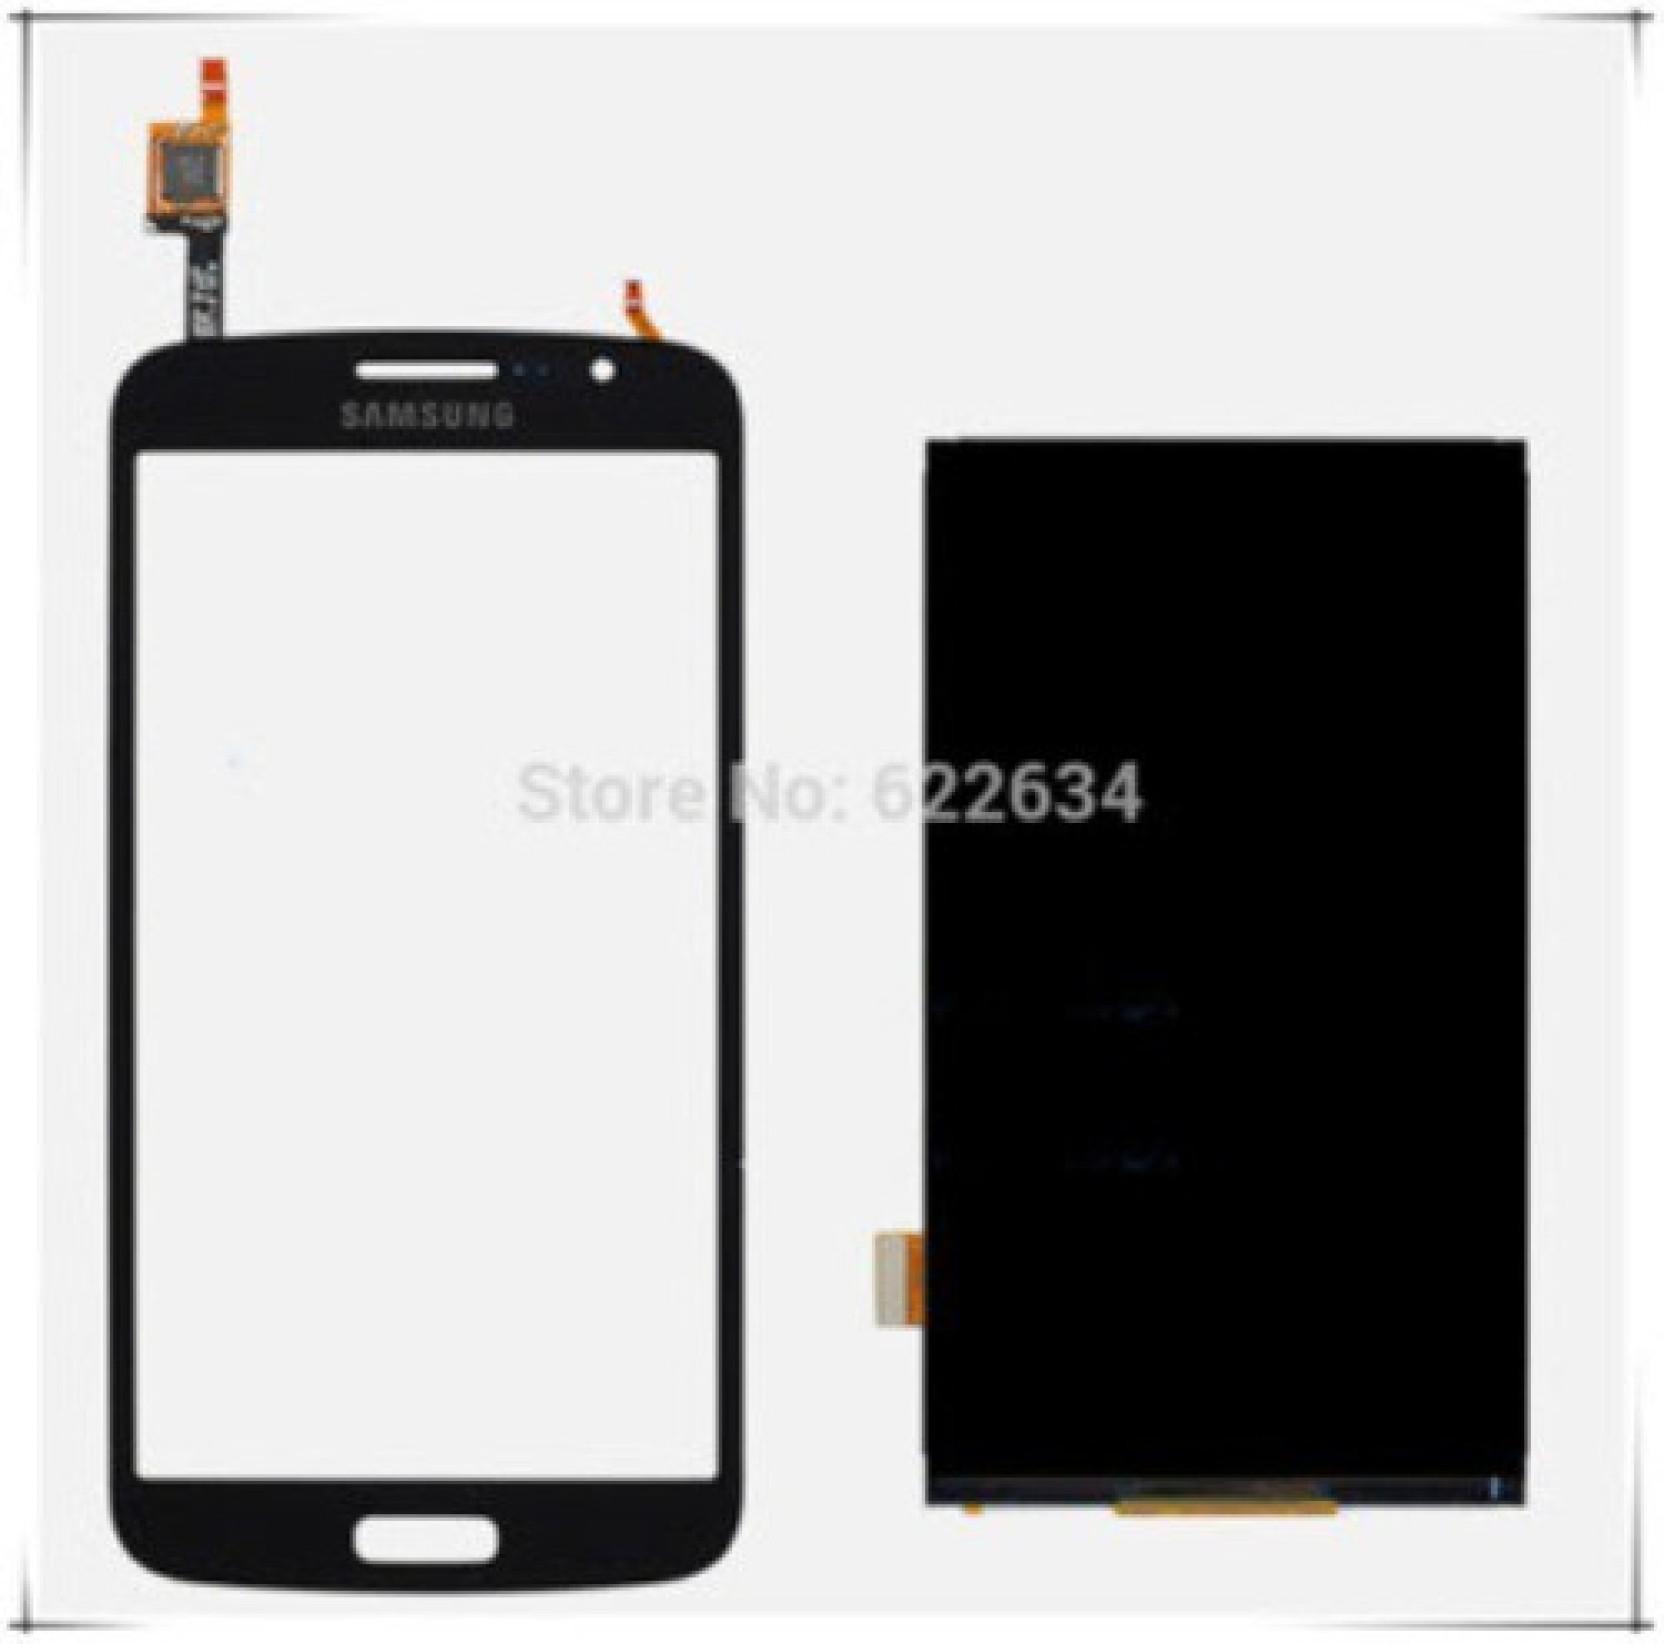 Samsung Galaxy Grand 2 G7102 Lcd Price In India Buy Touchscreen S3 Mini White Original Share